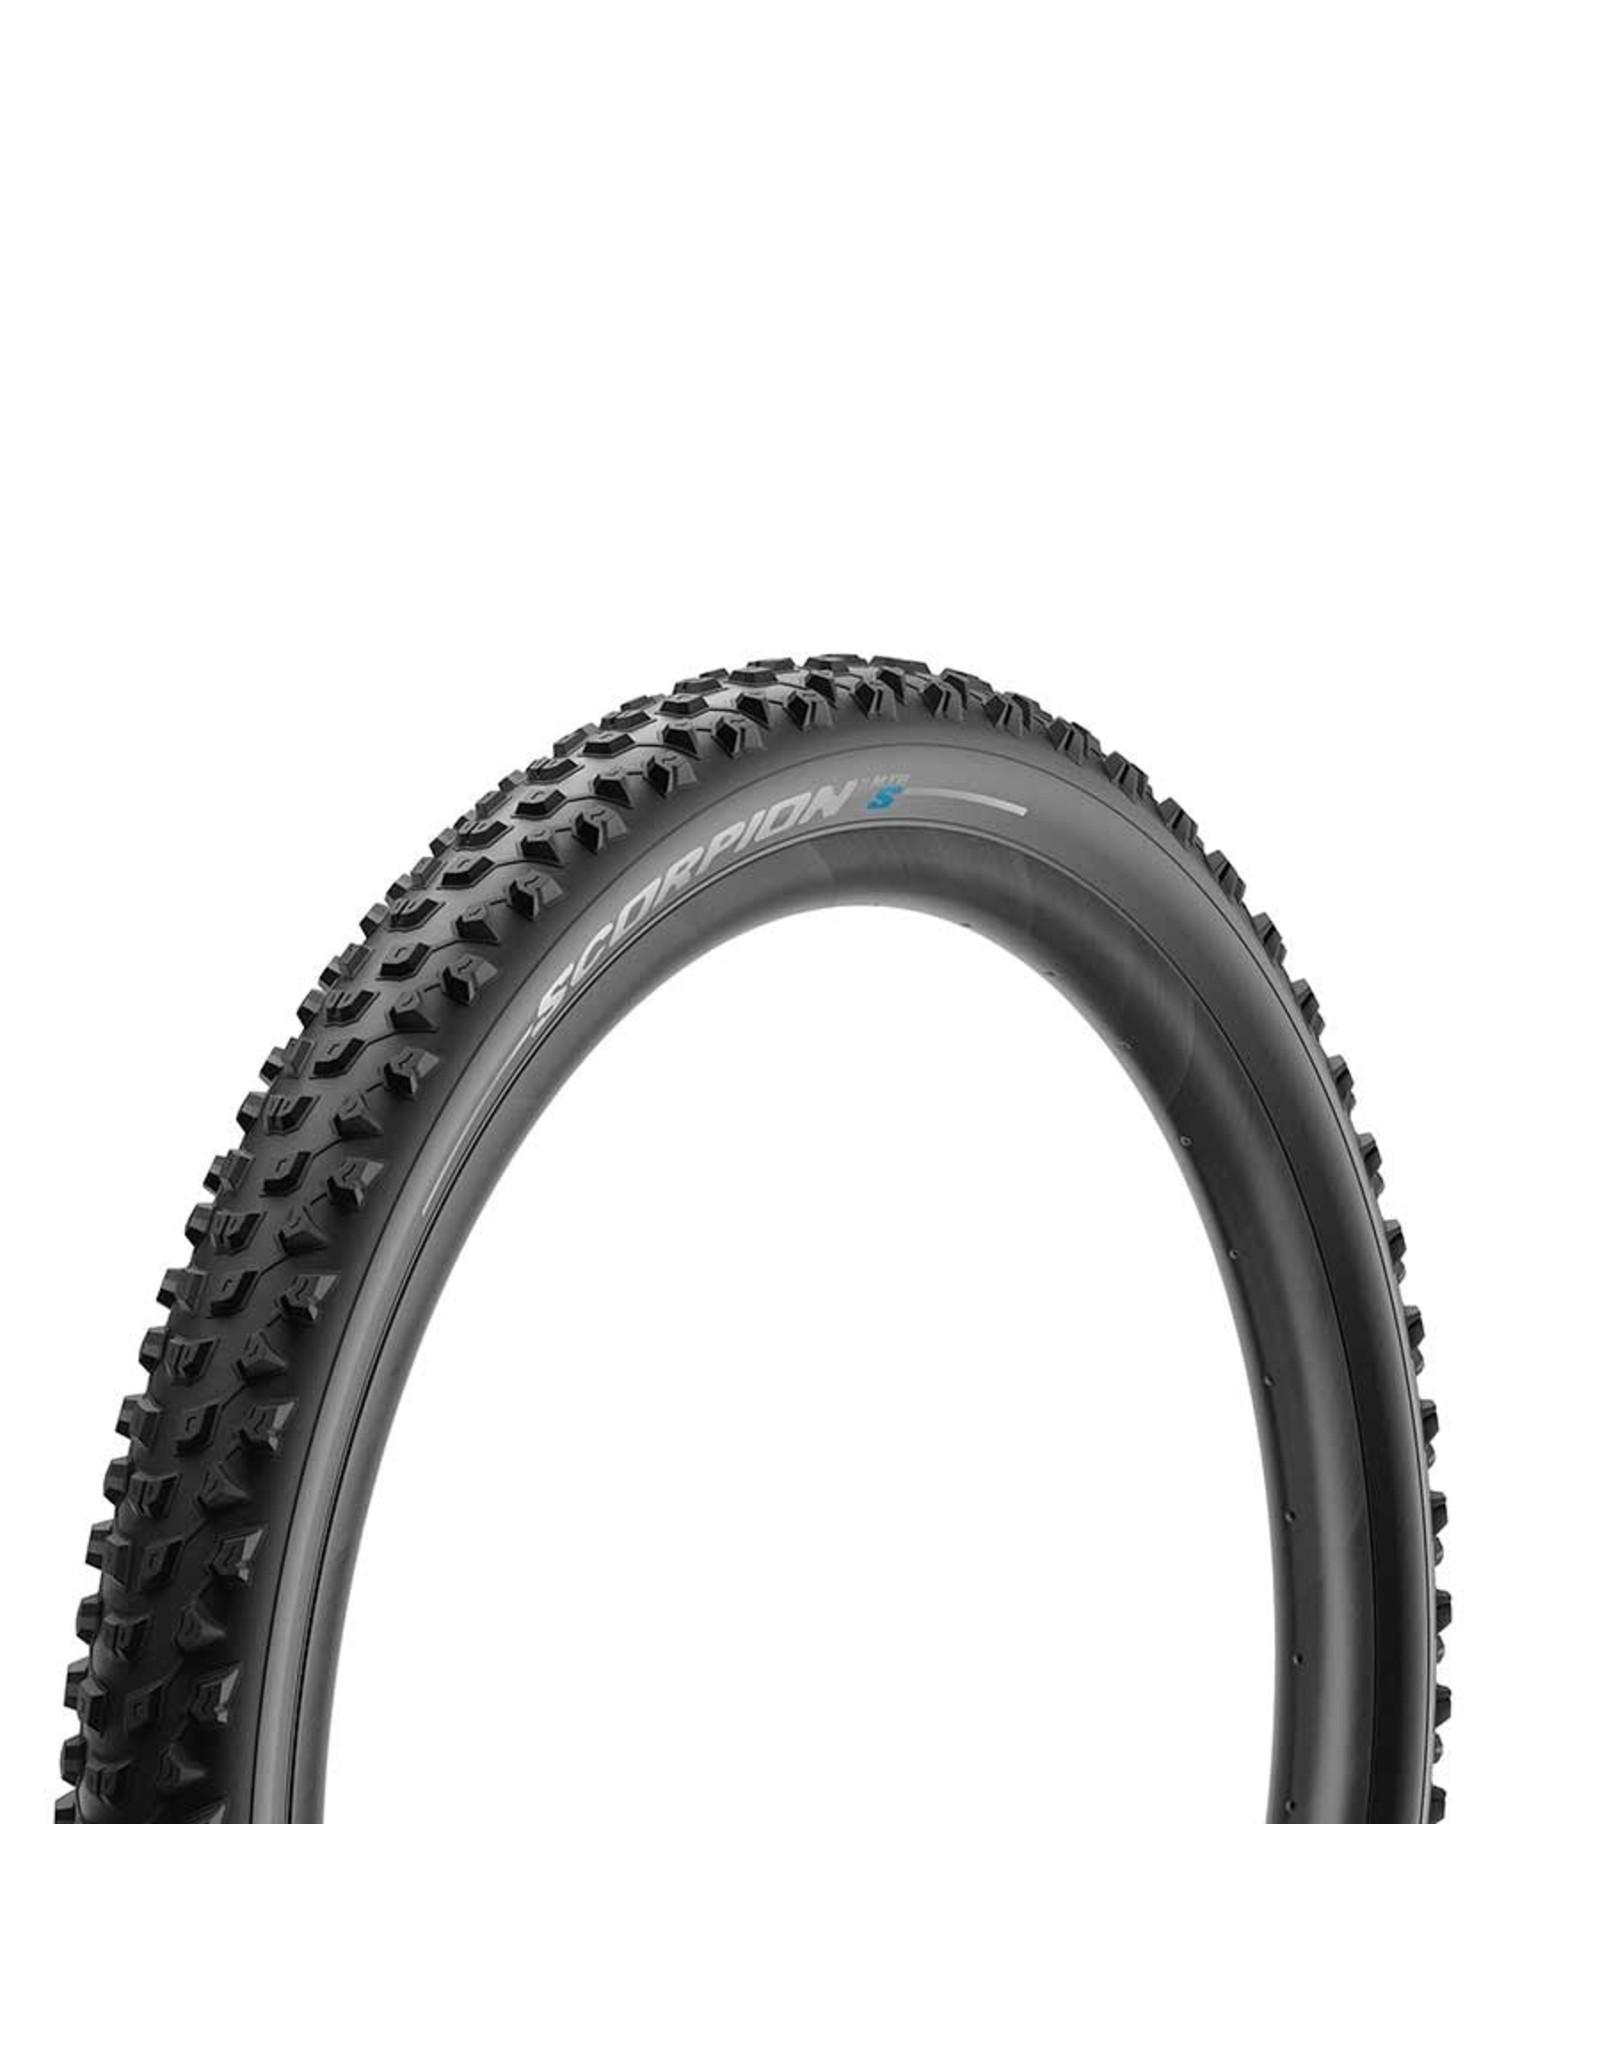 Pirelli Pirelli, Scorpion MTB S, Tire, 29''x2.40, Folding, Tubeless Ready, Smartgrip, 60TPI, Black